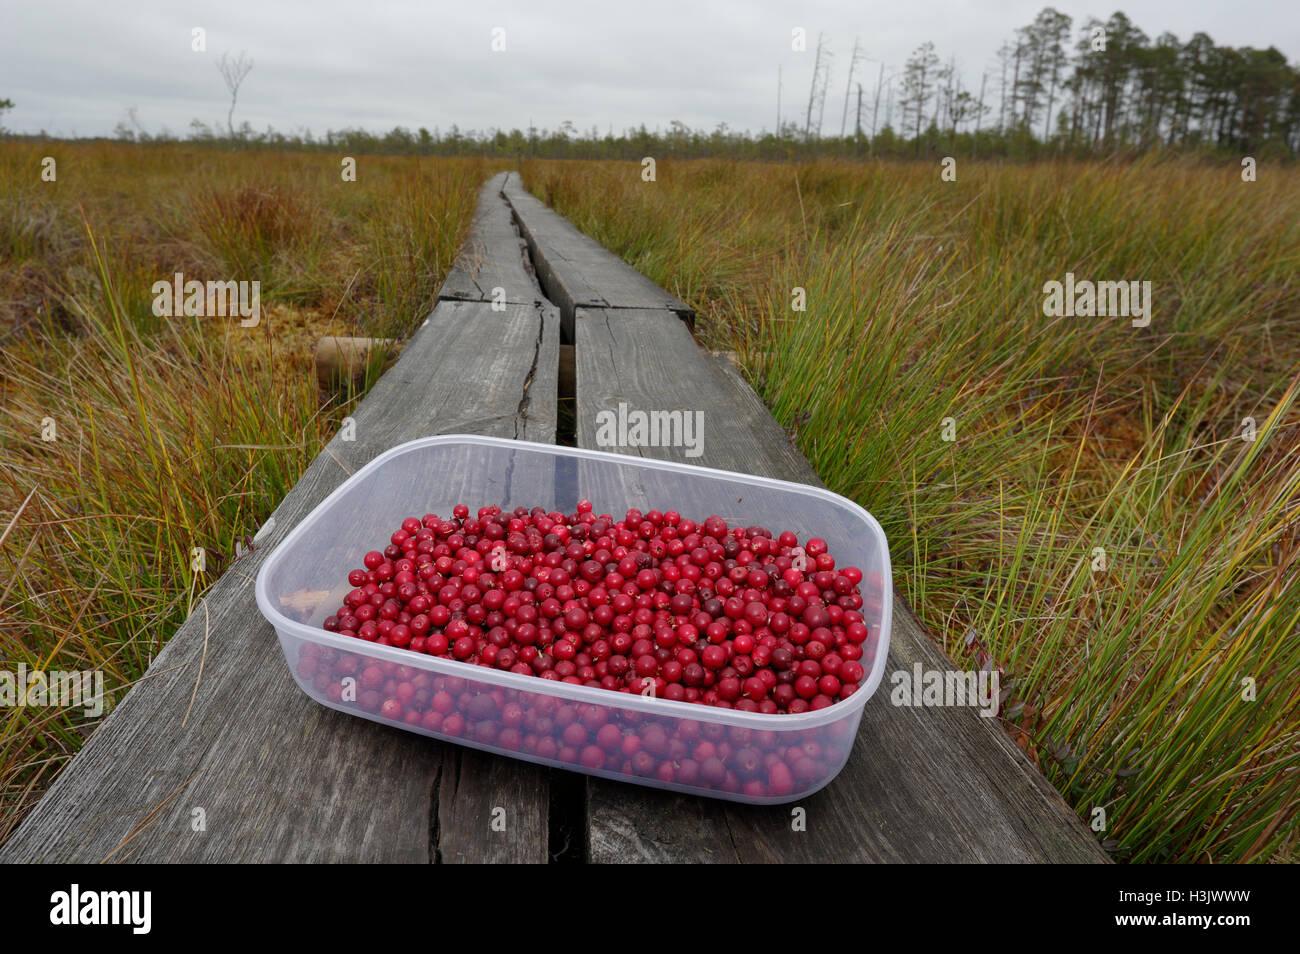 Freshly picked lingonberries. Alam-Pedja Nature Reserve. Estonia. - Stock Image